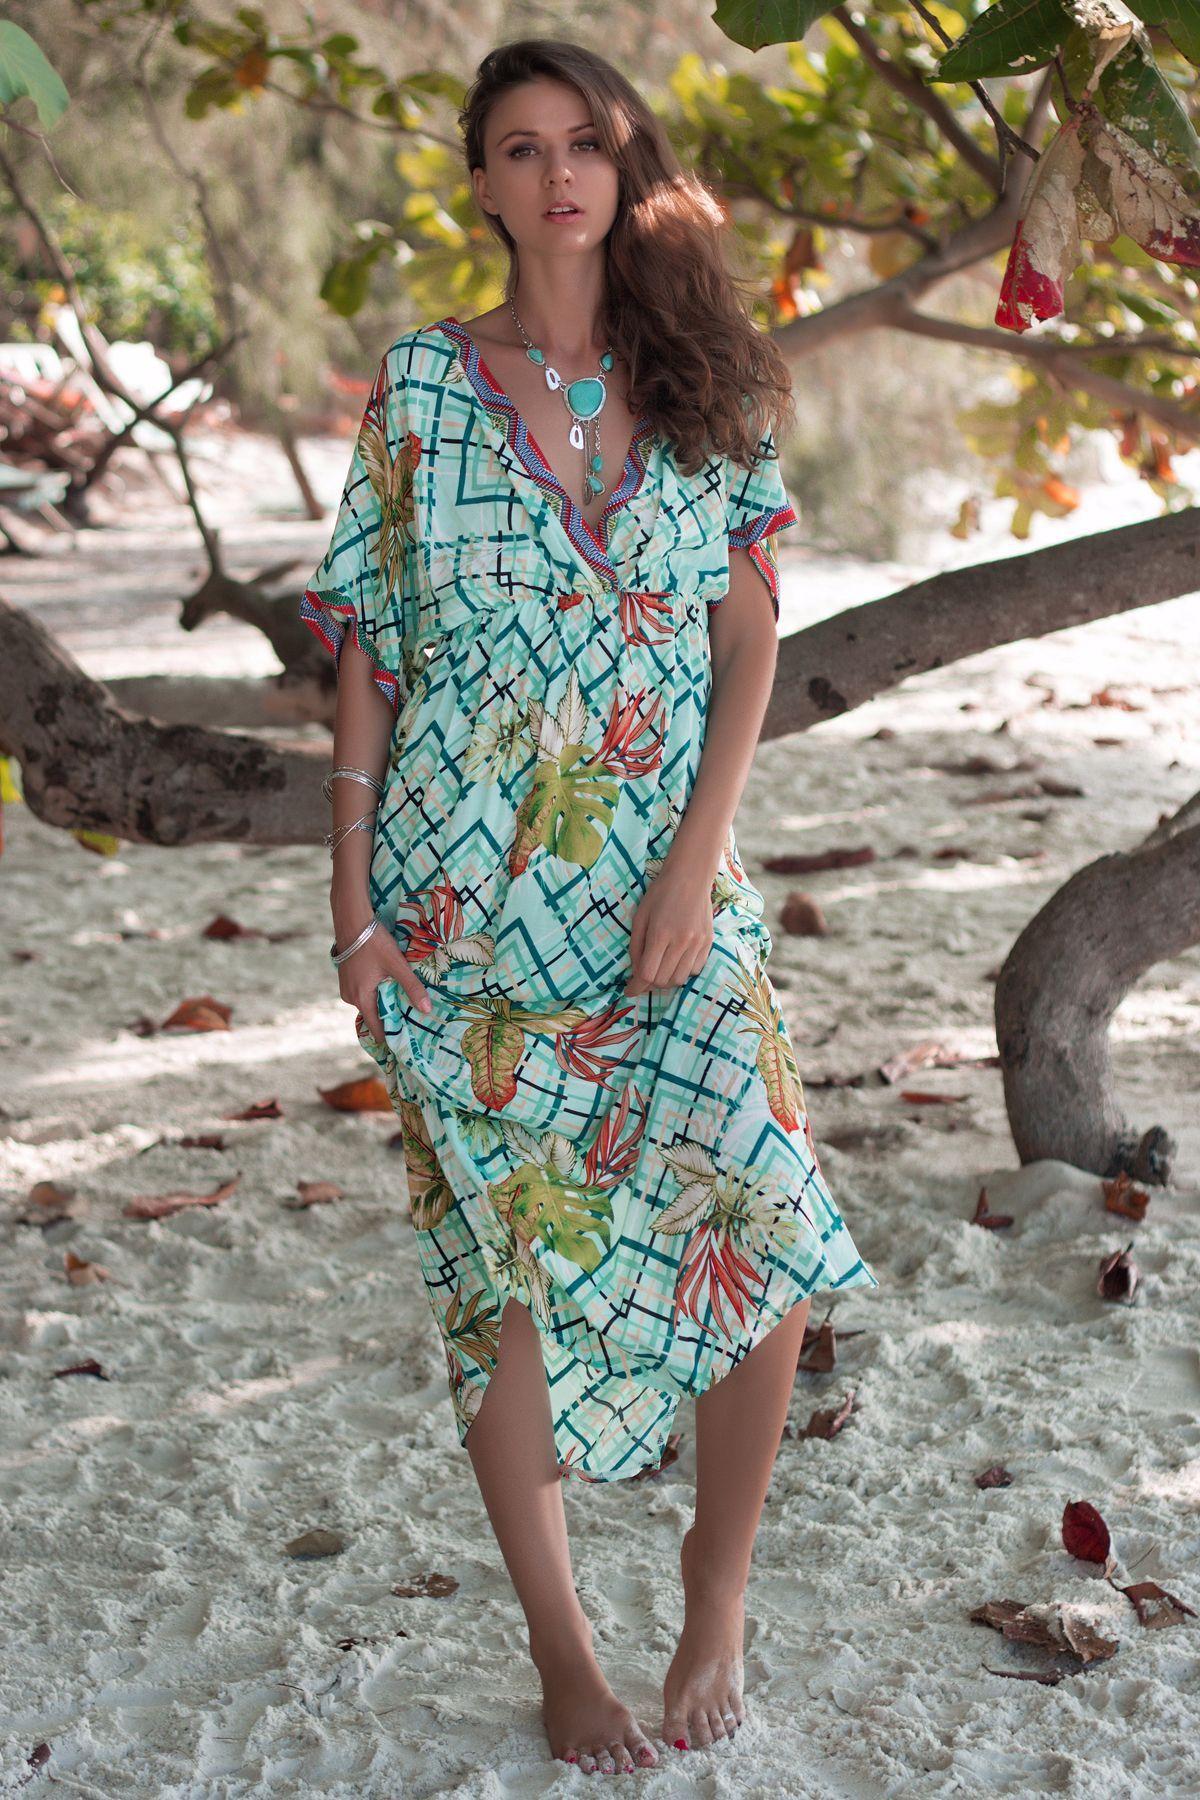 d02358d928 Women v neck Summer style printed holiday dresses Length(cm): Long Closure  Type